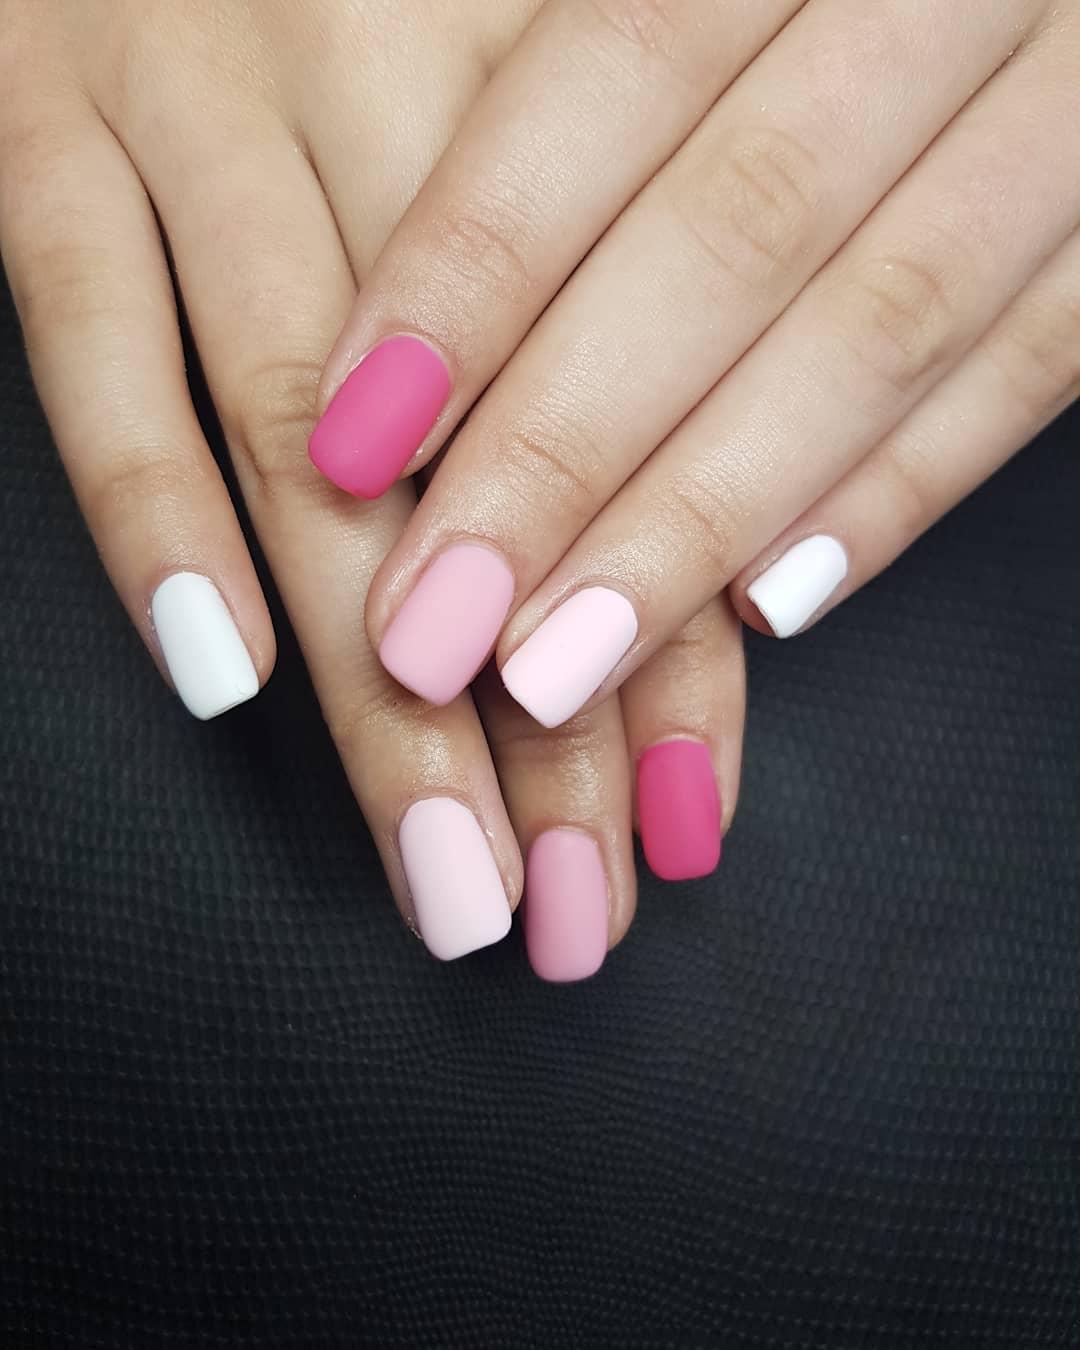 uñas mate rosa pastel